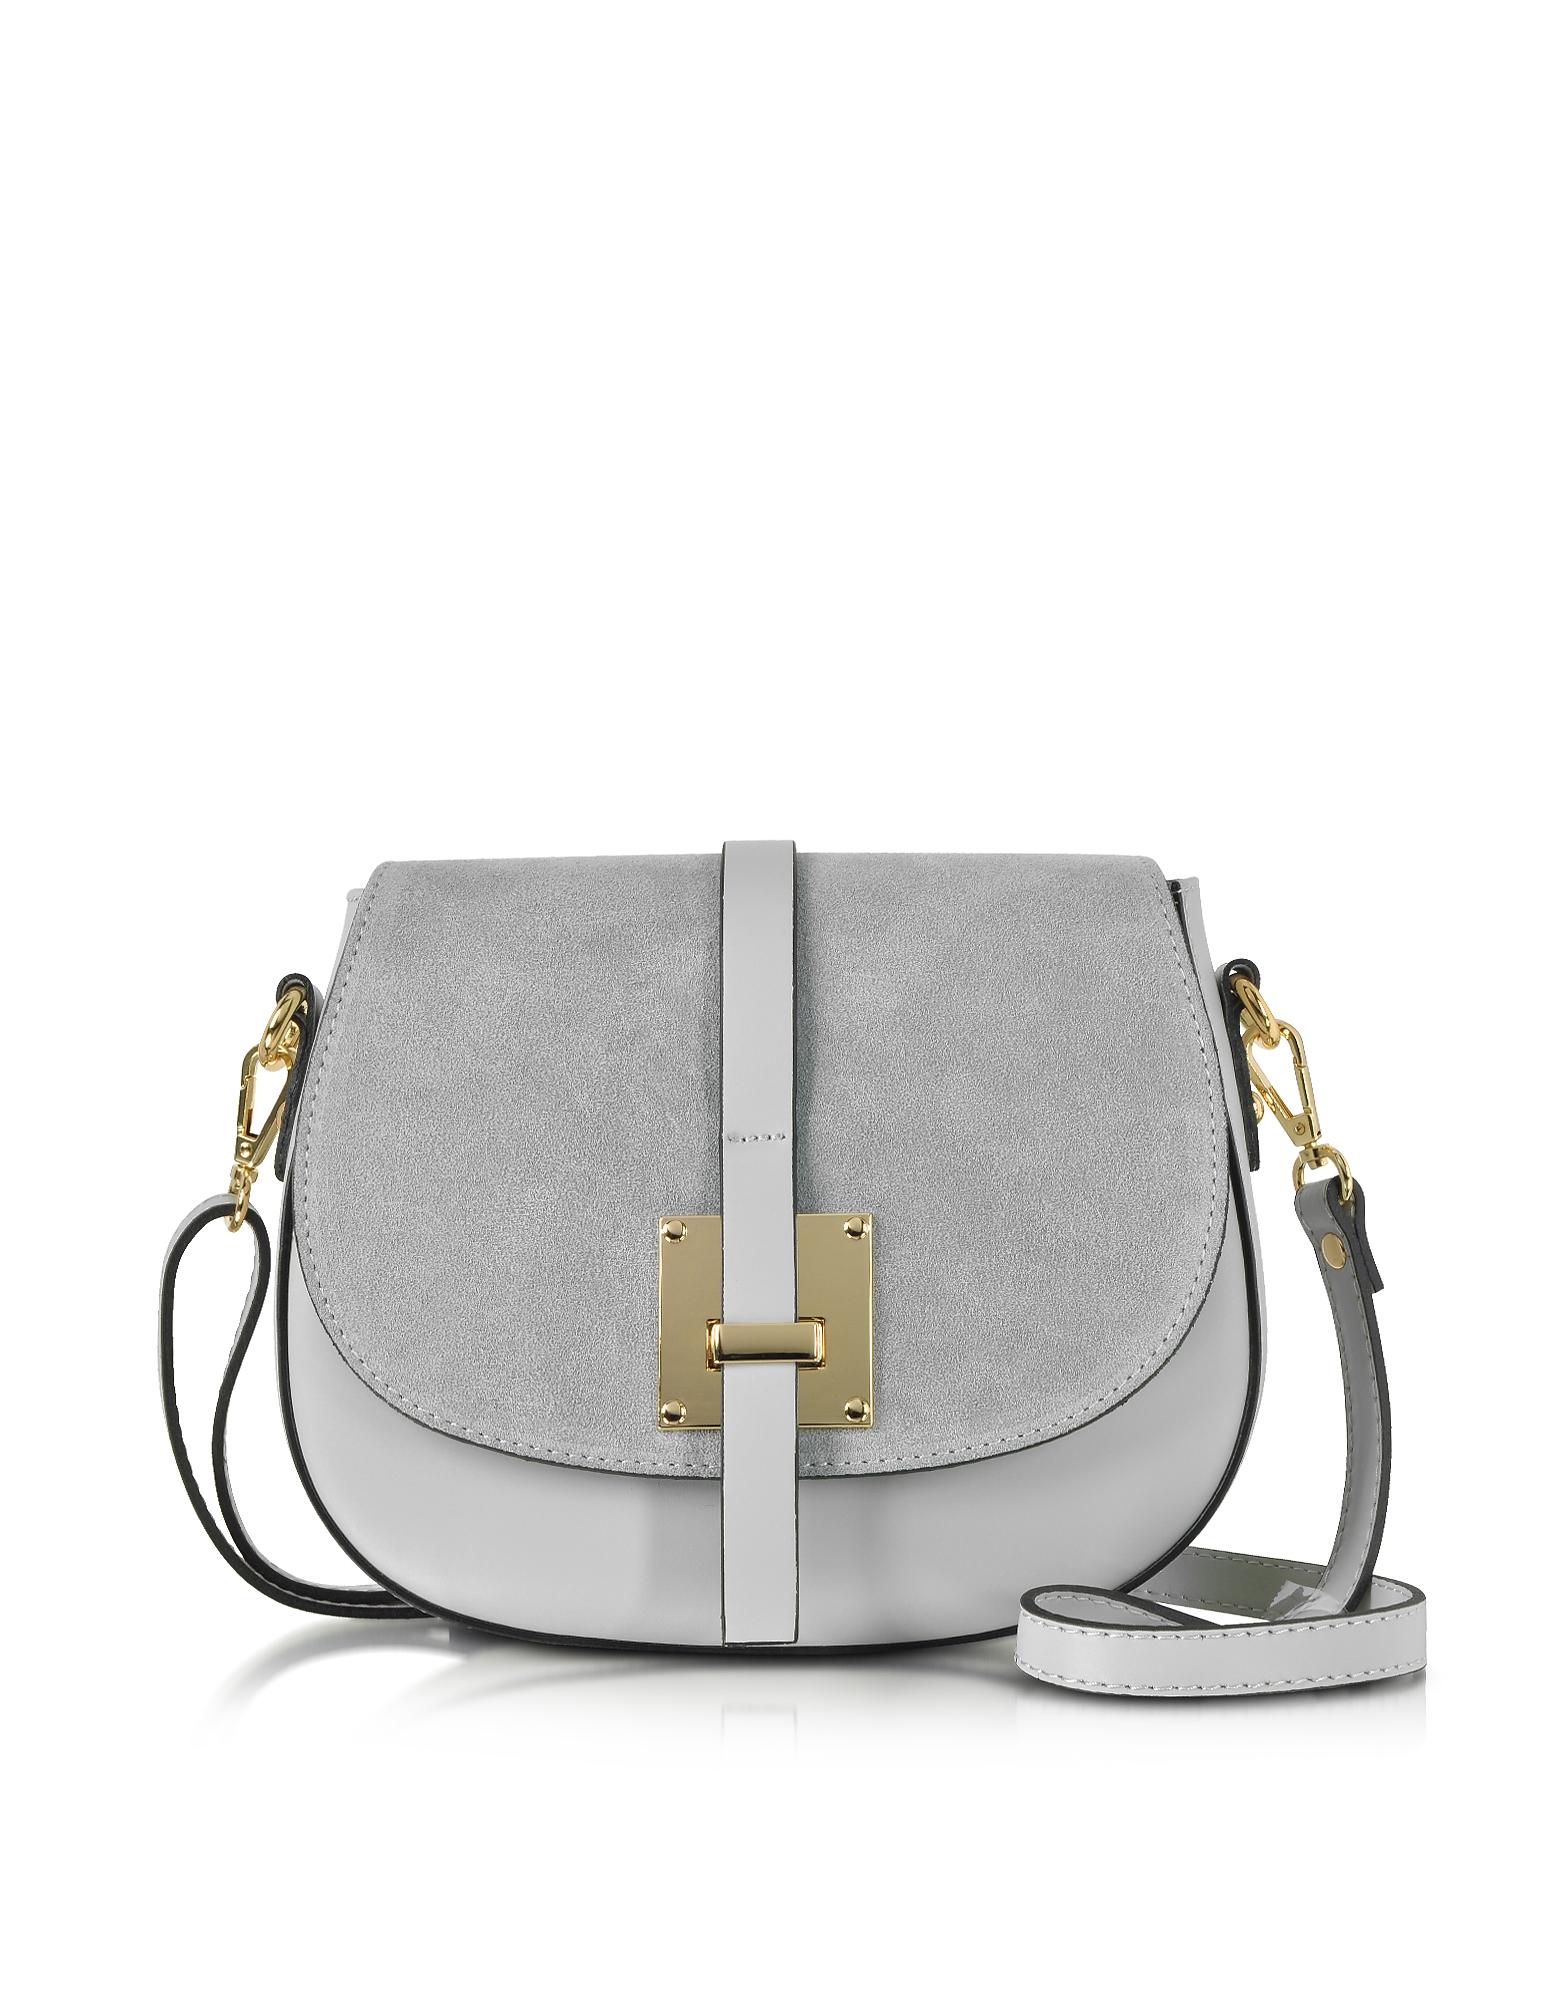 Le Parmentier Handbags, Pollia Pearl Gray Leather and Suede Crossbody Bag